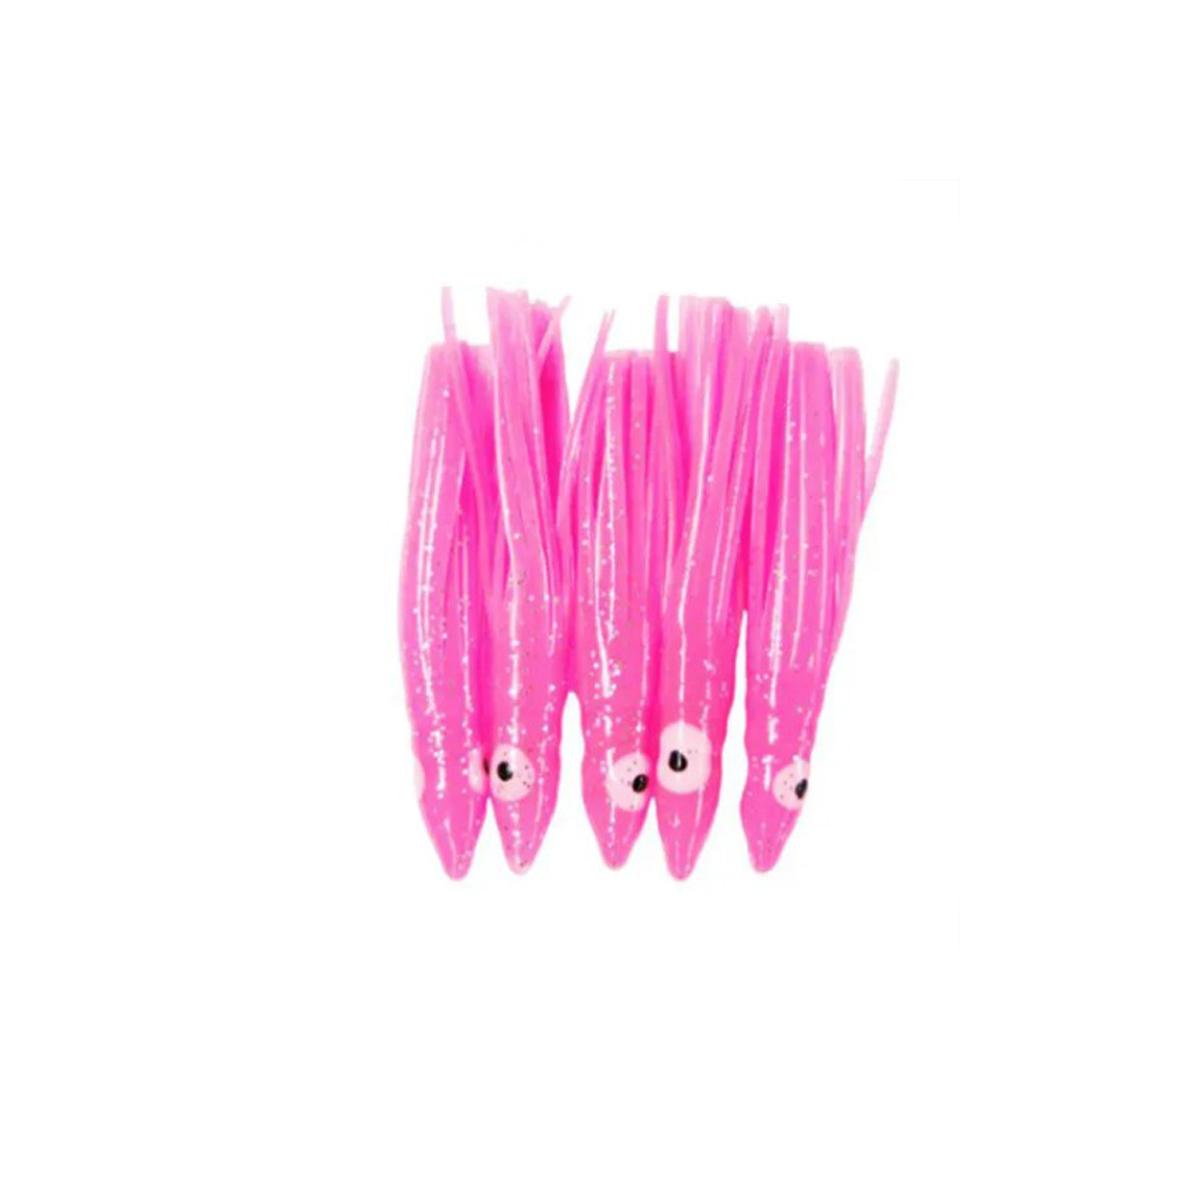 Kit 15 Lulinhas Kalmar 7,6 cm (Rosa)  - Pró Pesca Shop